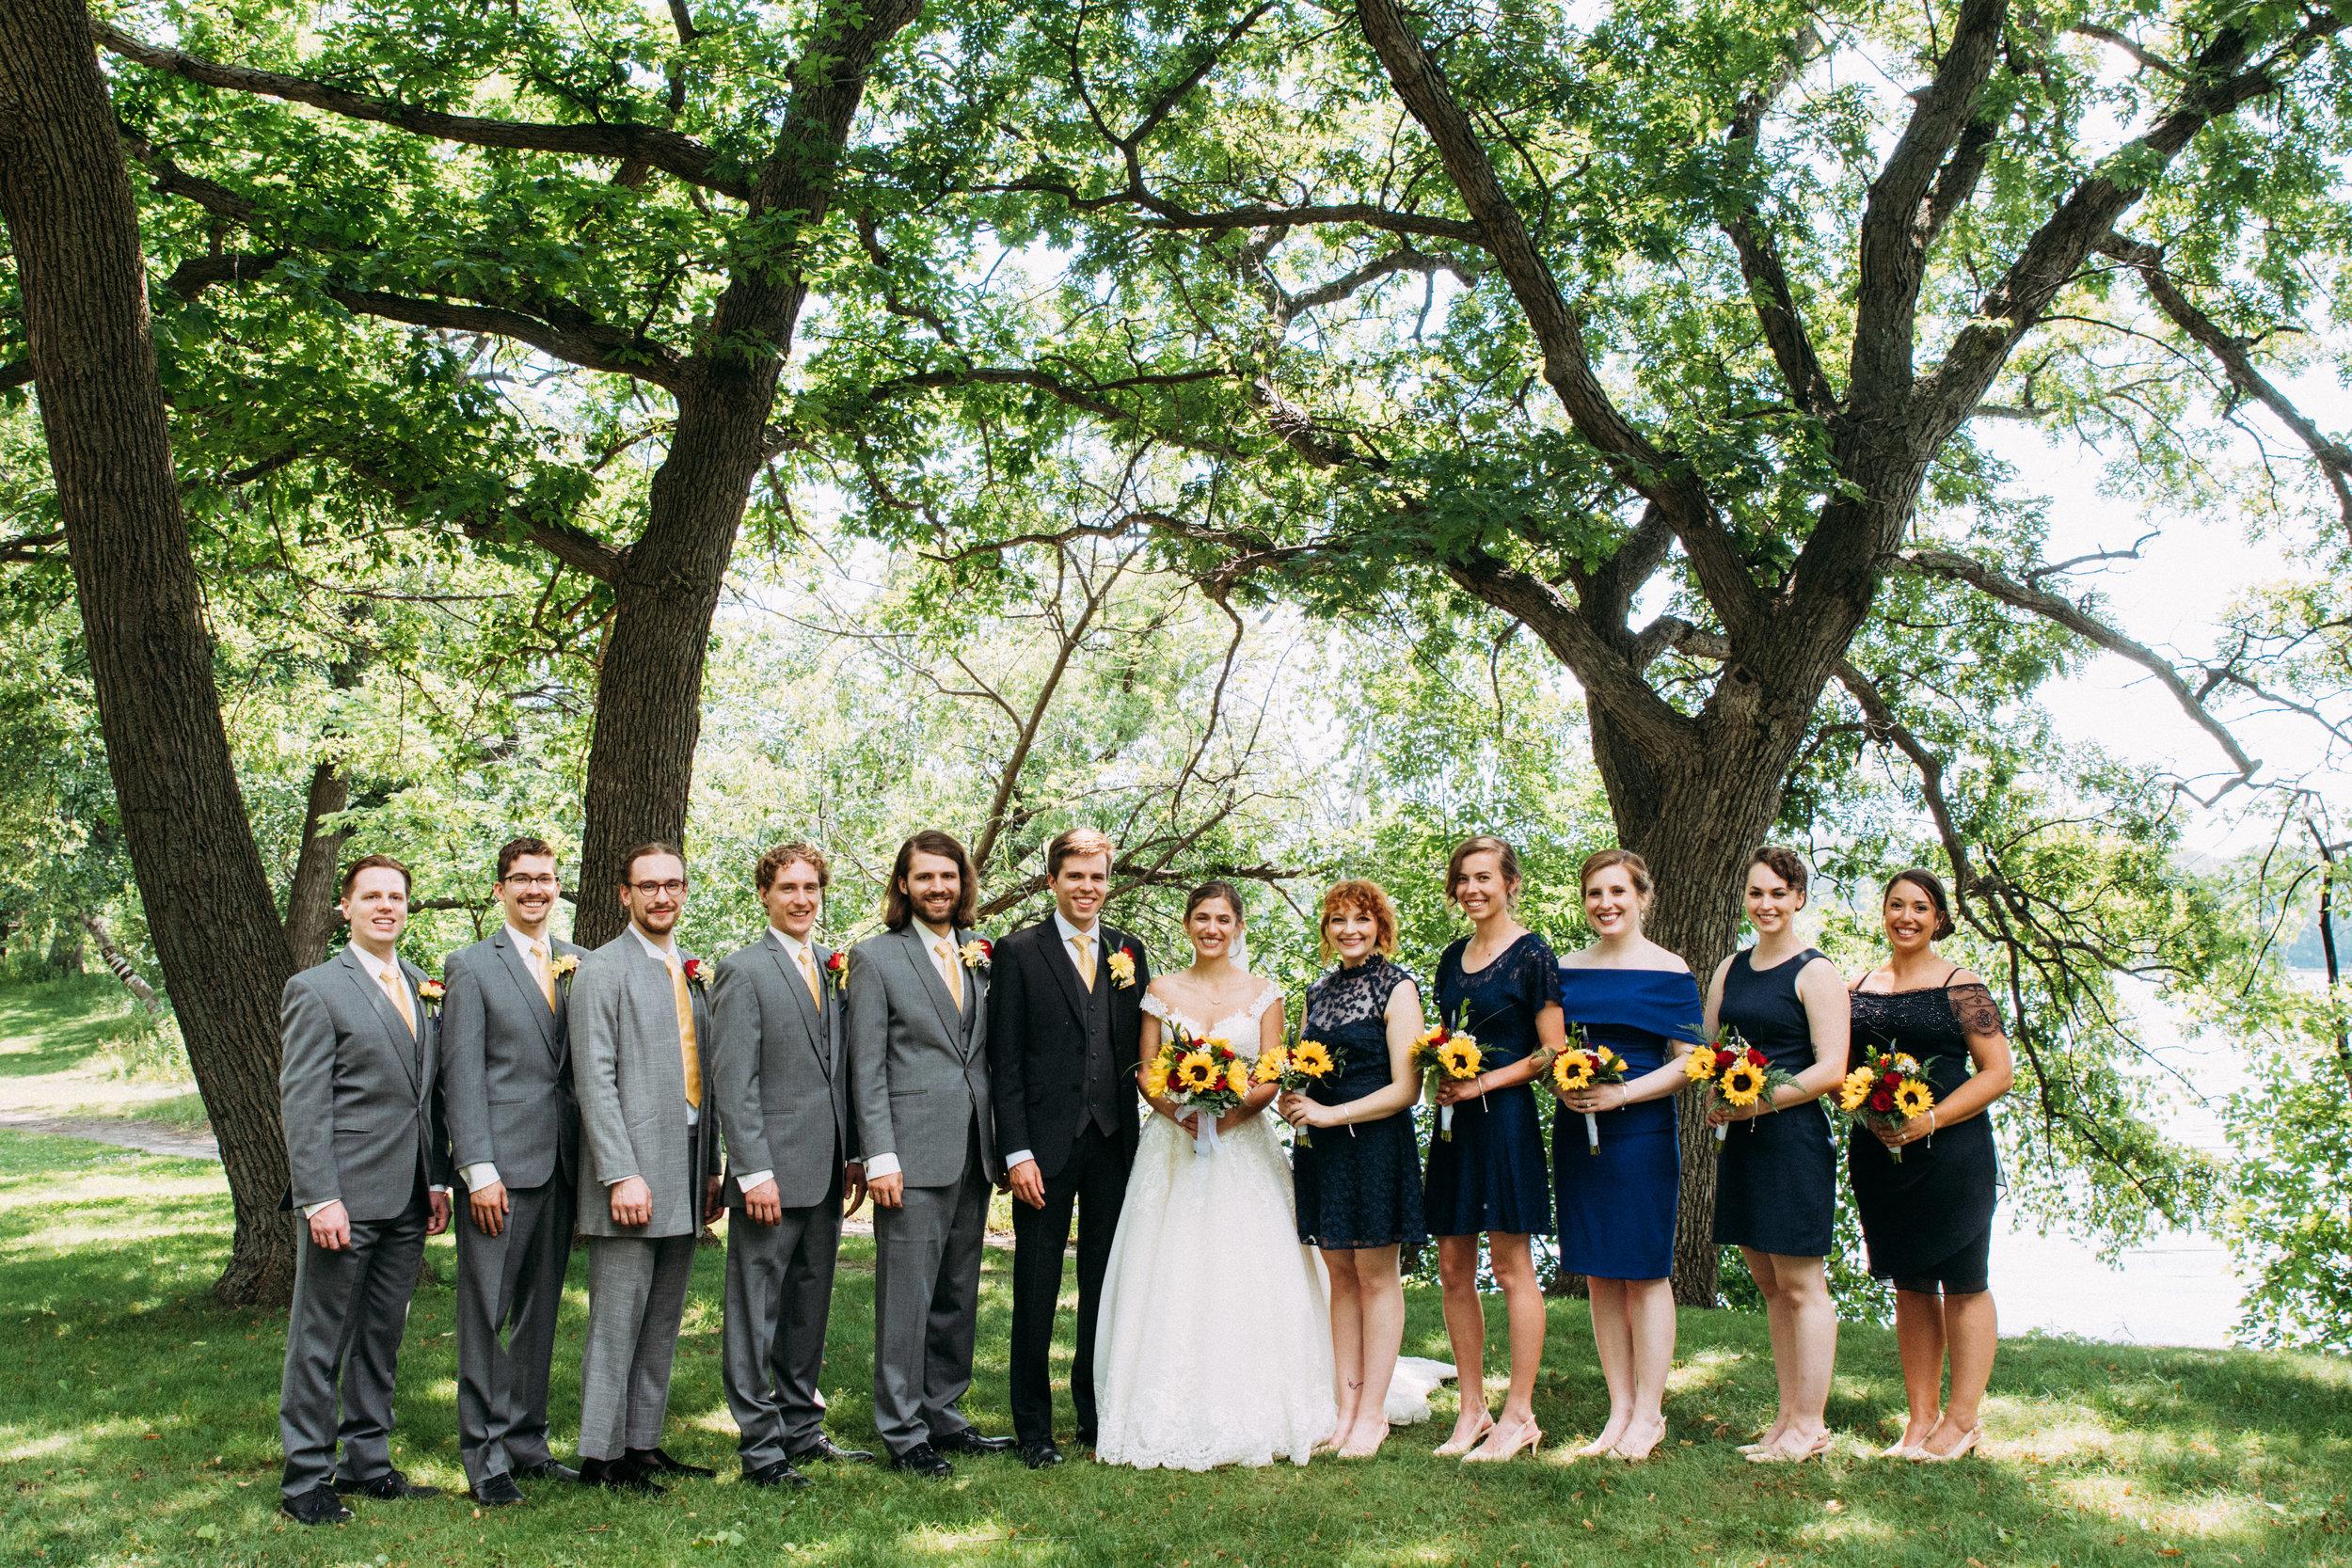 13-Liza_Chris_Minneapolis_Minnesota_Wedding.jpg